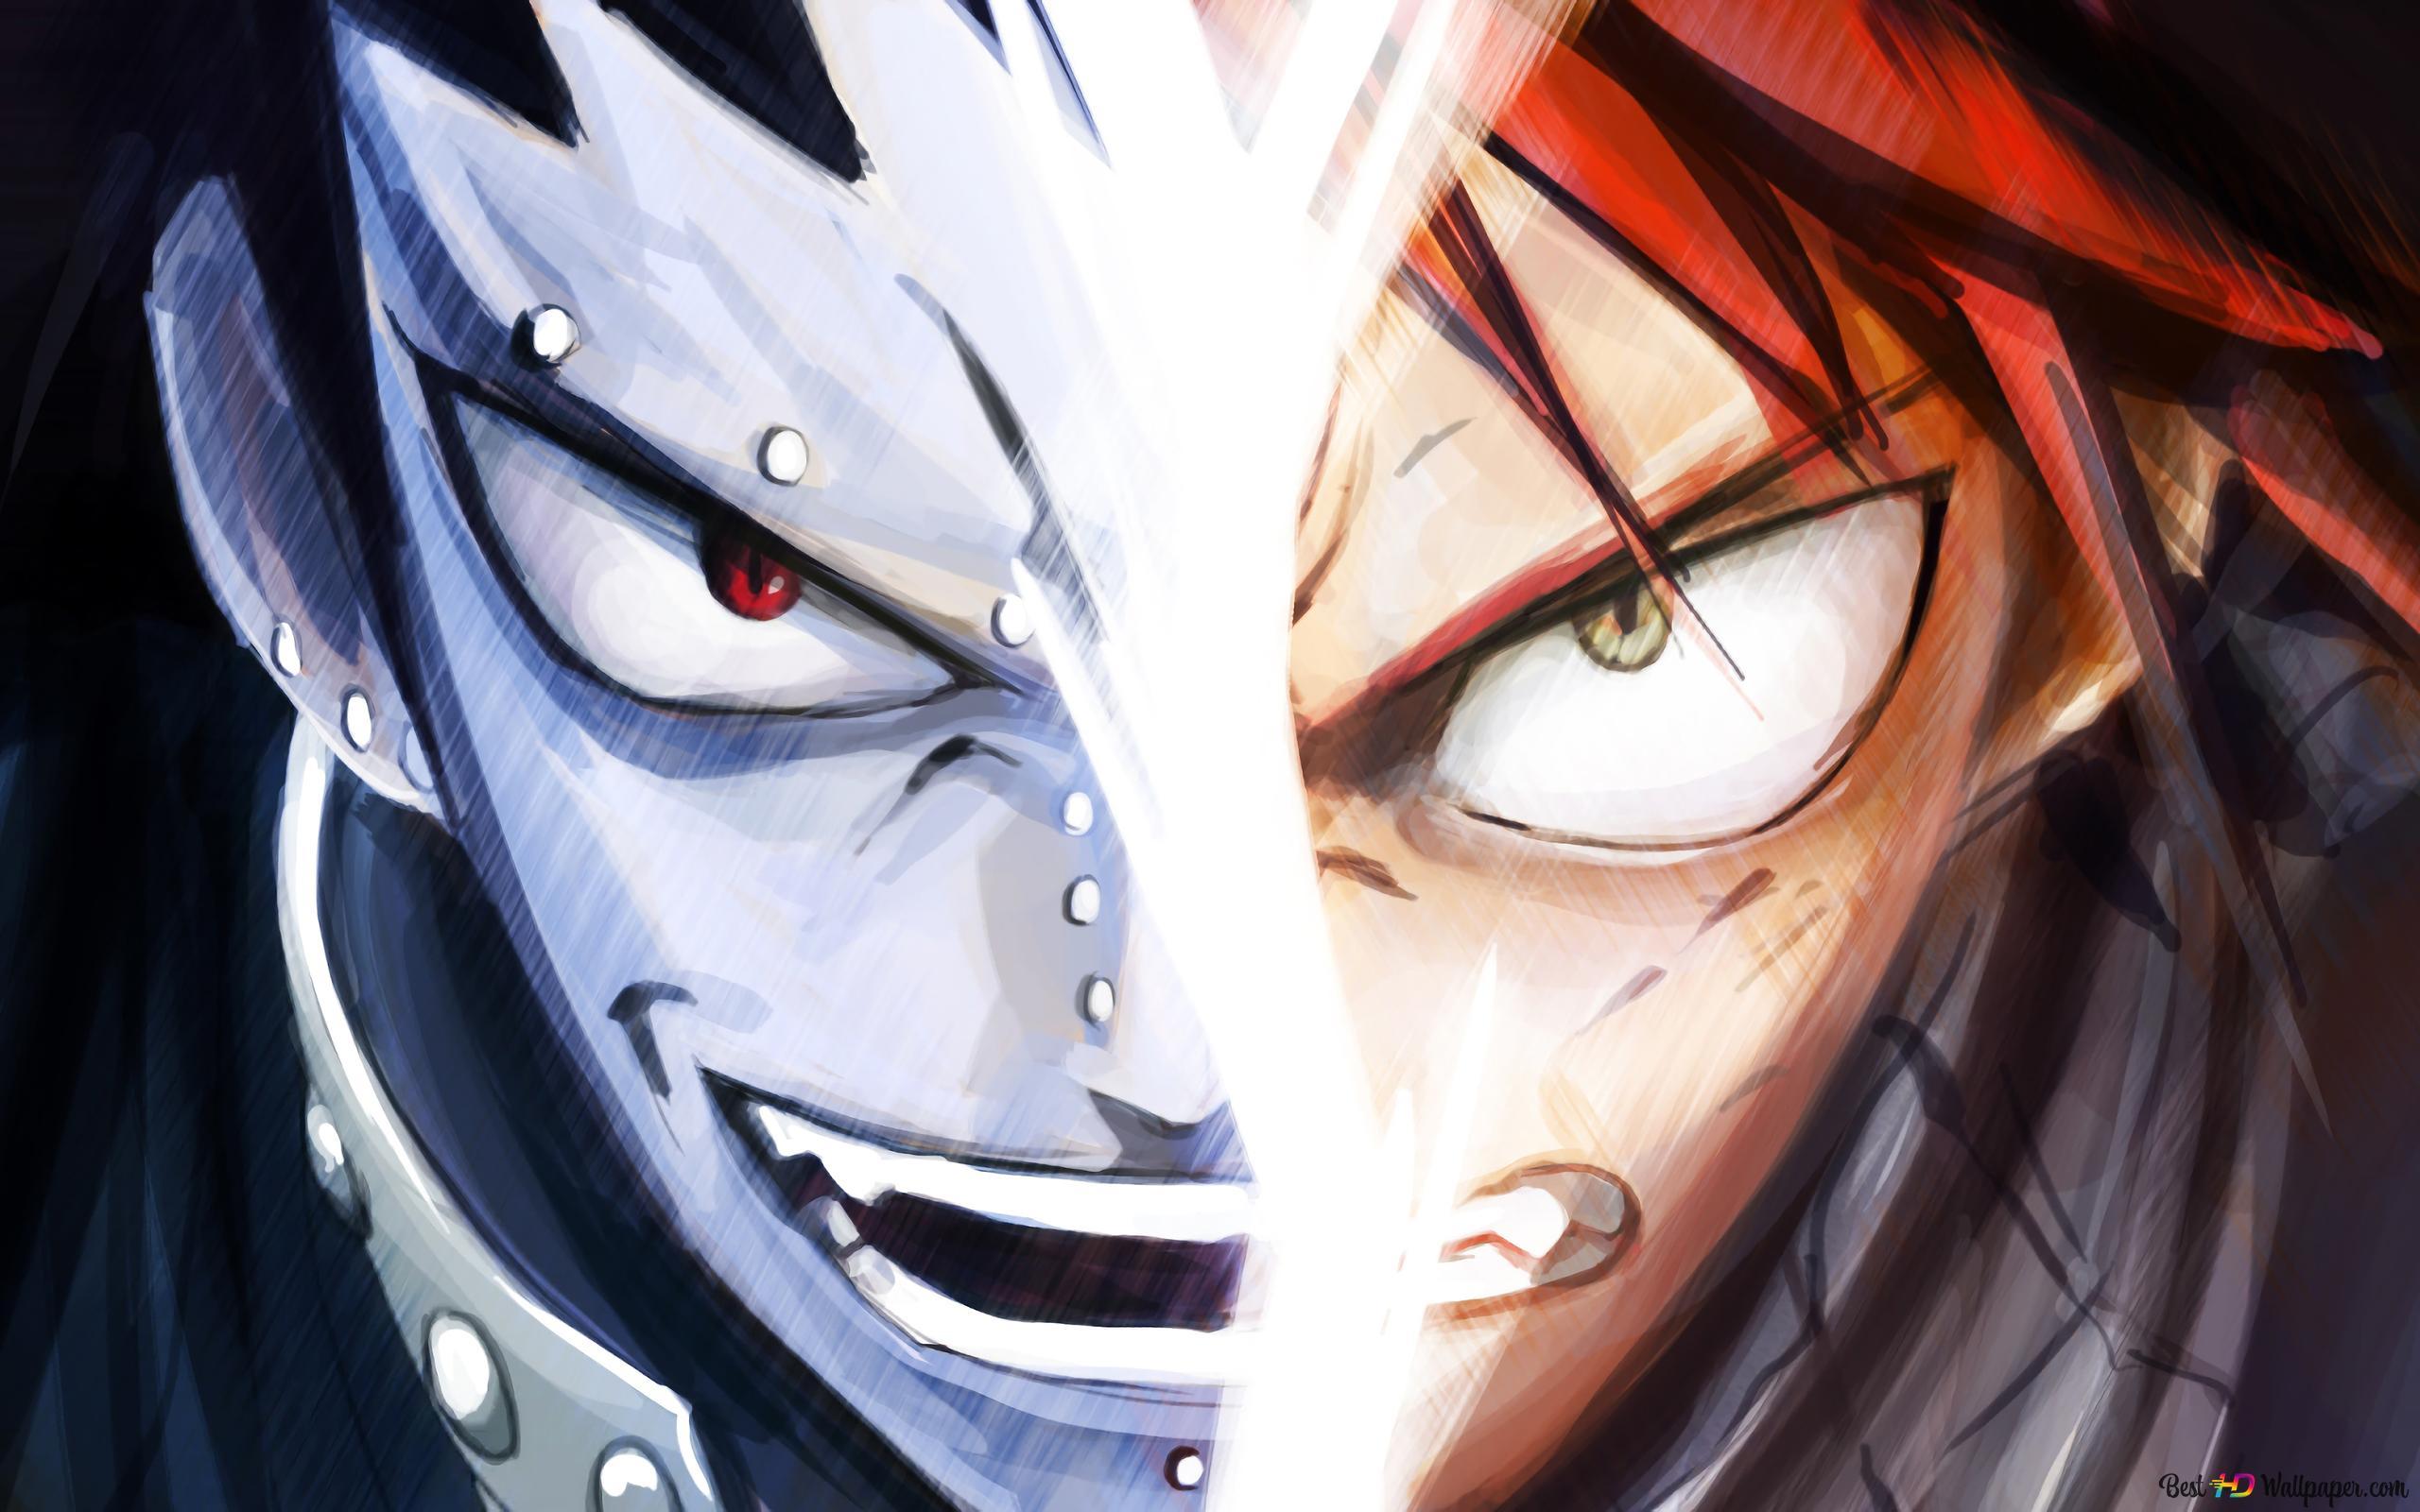 Fairy Tail Gajeel Redfox Vs Natsu Dragneel Hd Wallpaper Download